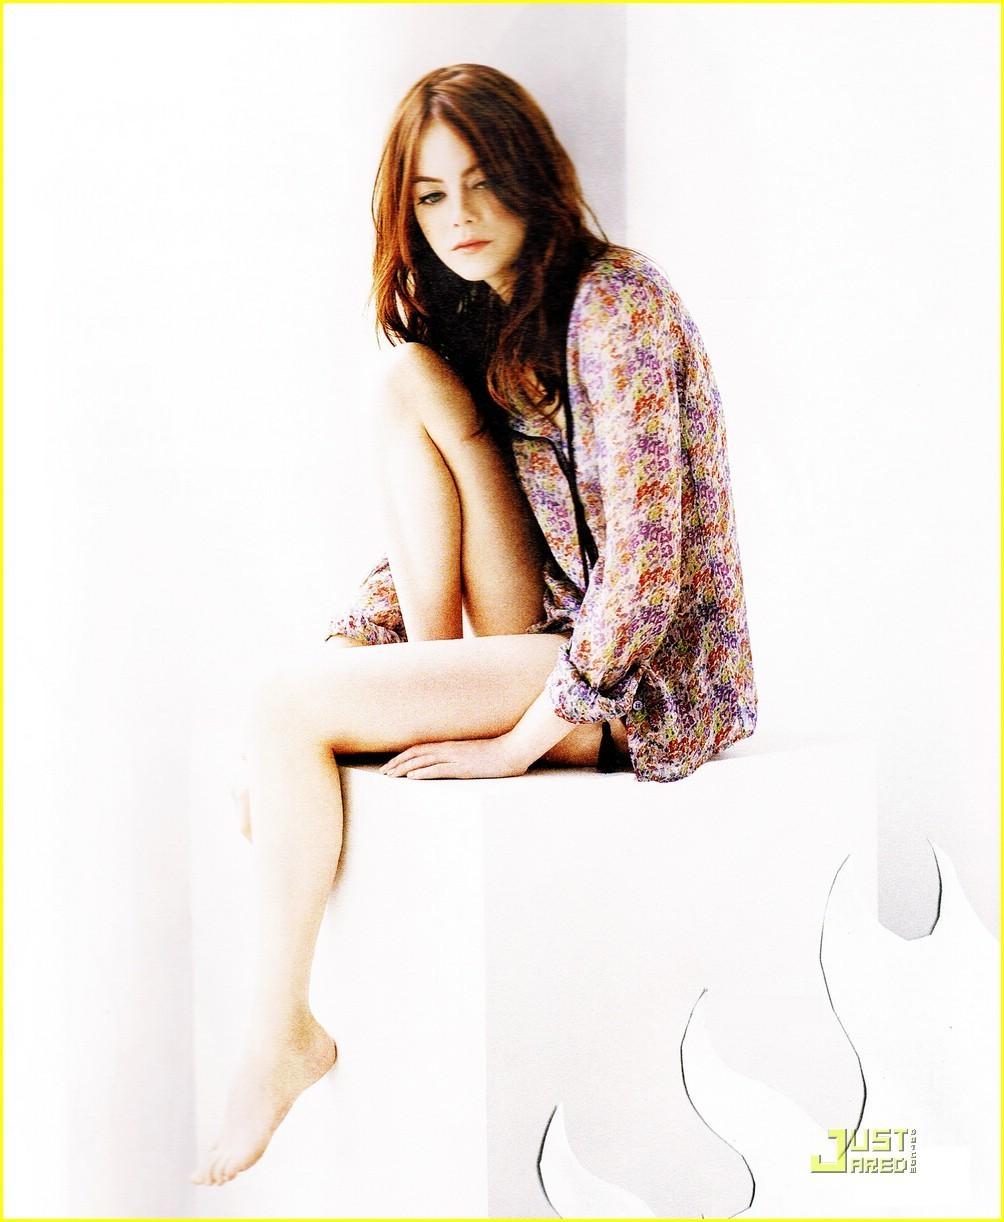 Emma Stone - Emma Stone Photo (11816056) - Fanpop